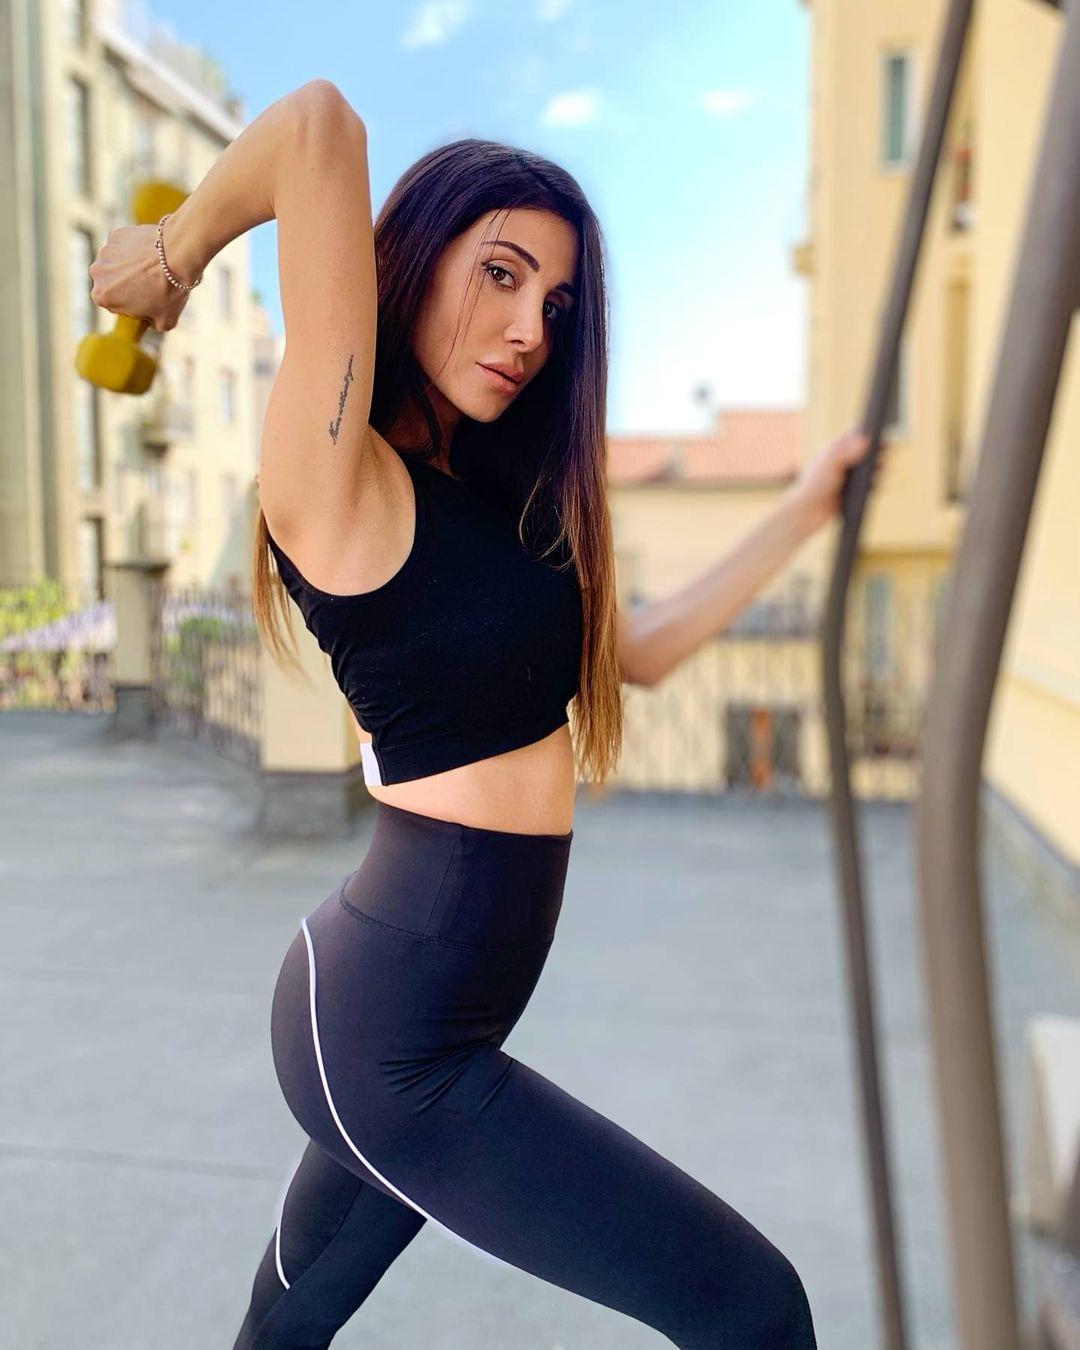 Elisabetta-Galimi-Wallpapers-Insta-Fit-Bio-10